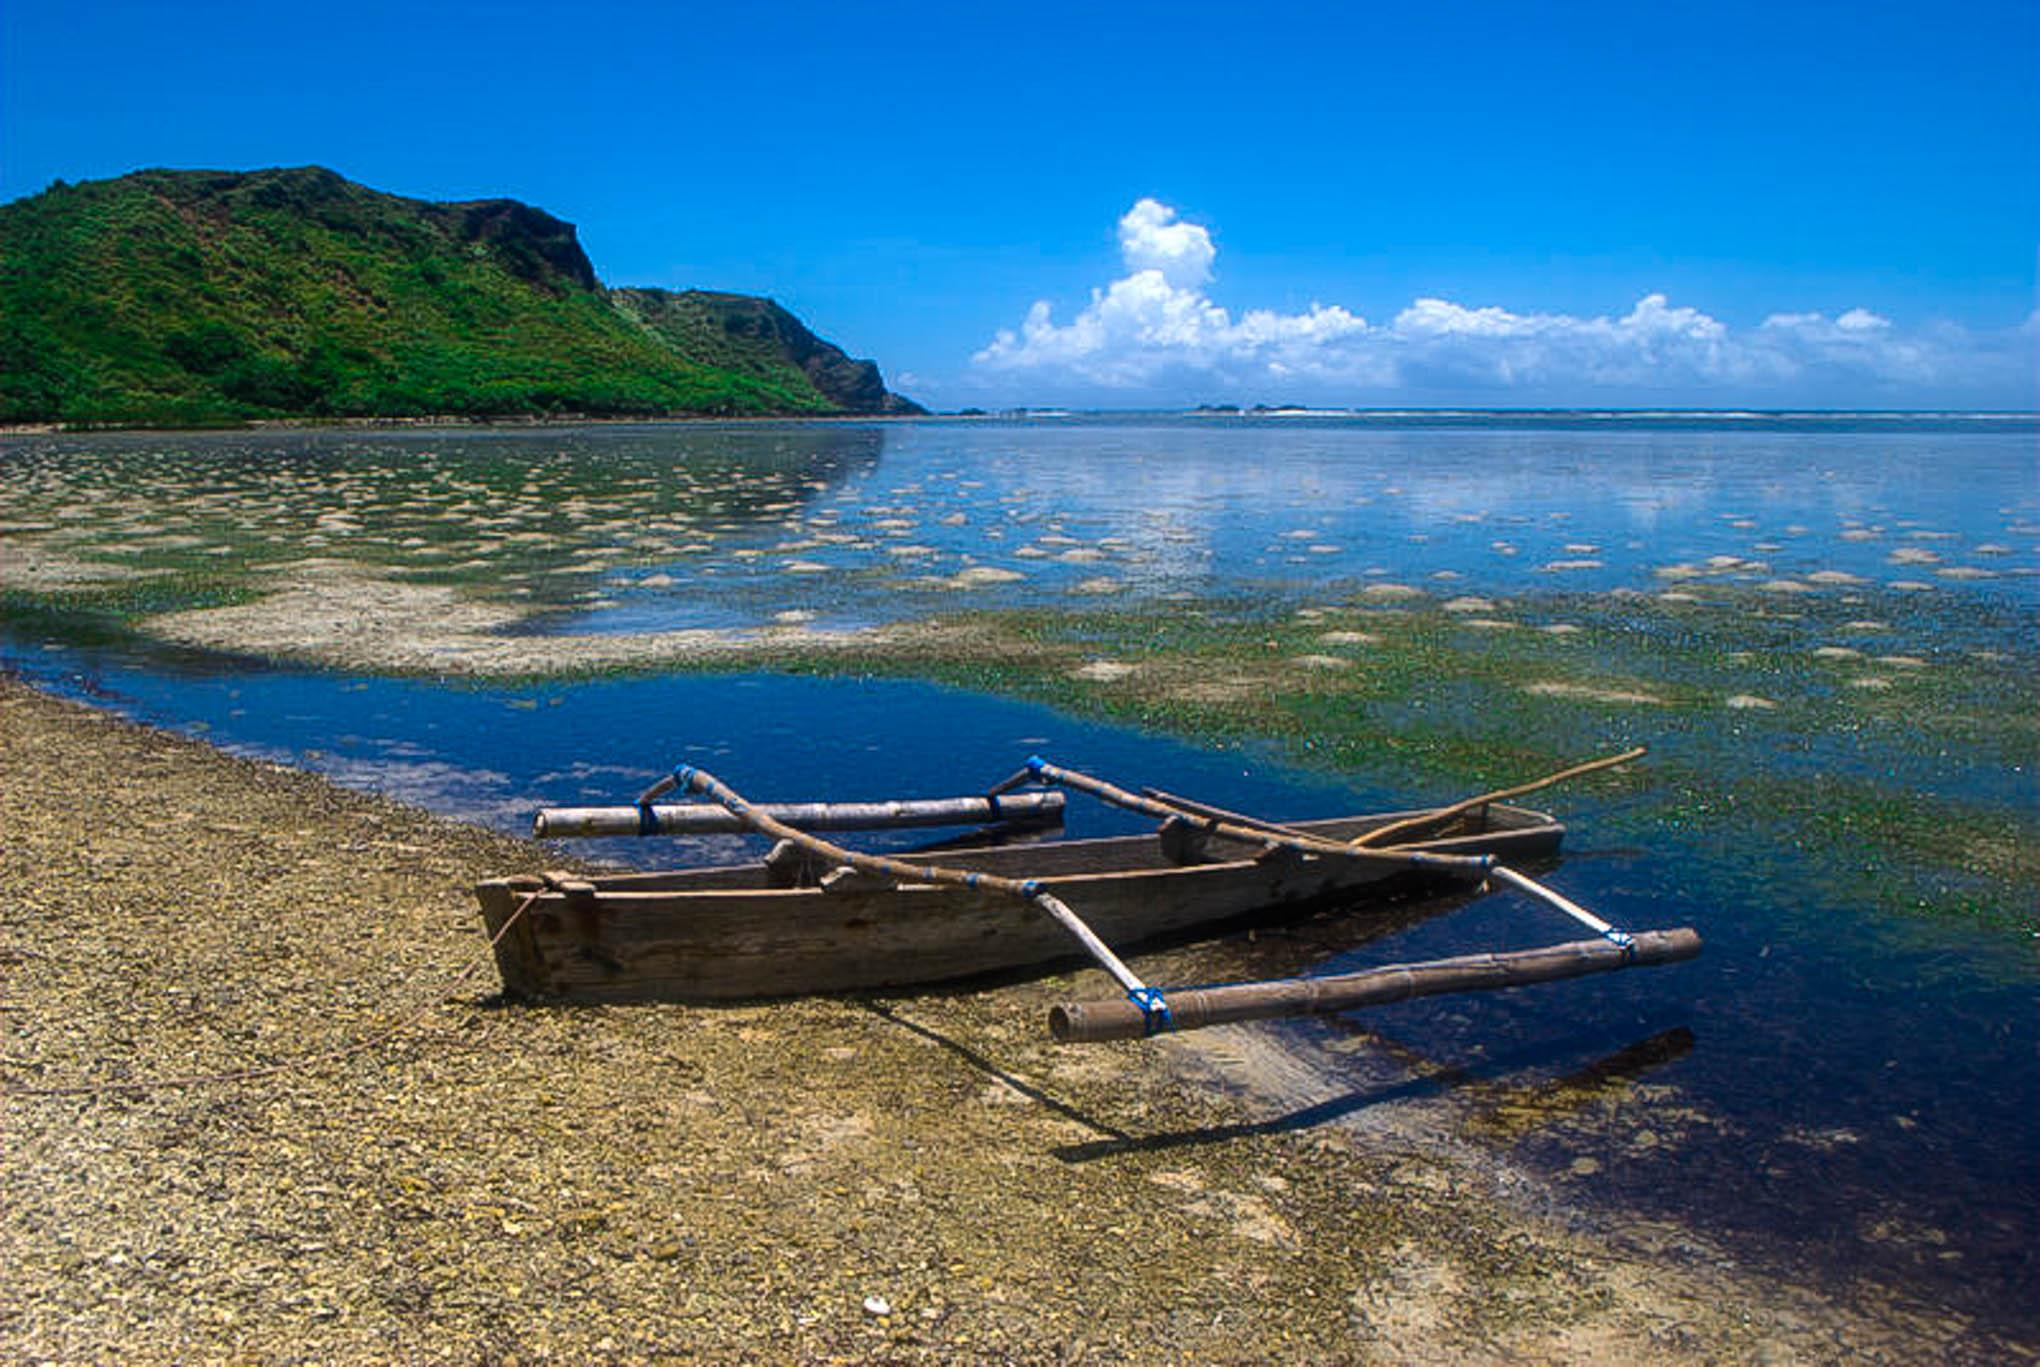 palaui island 5 (1 of 1)